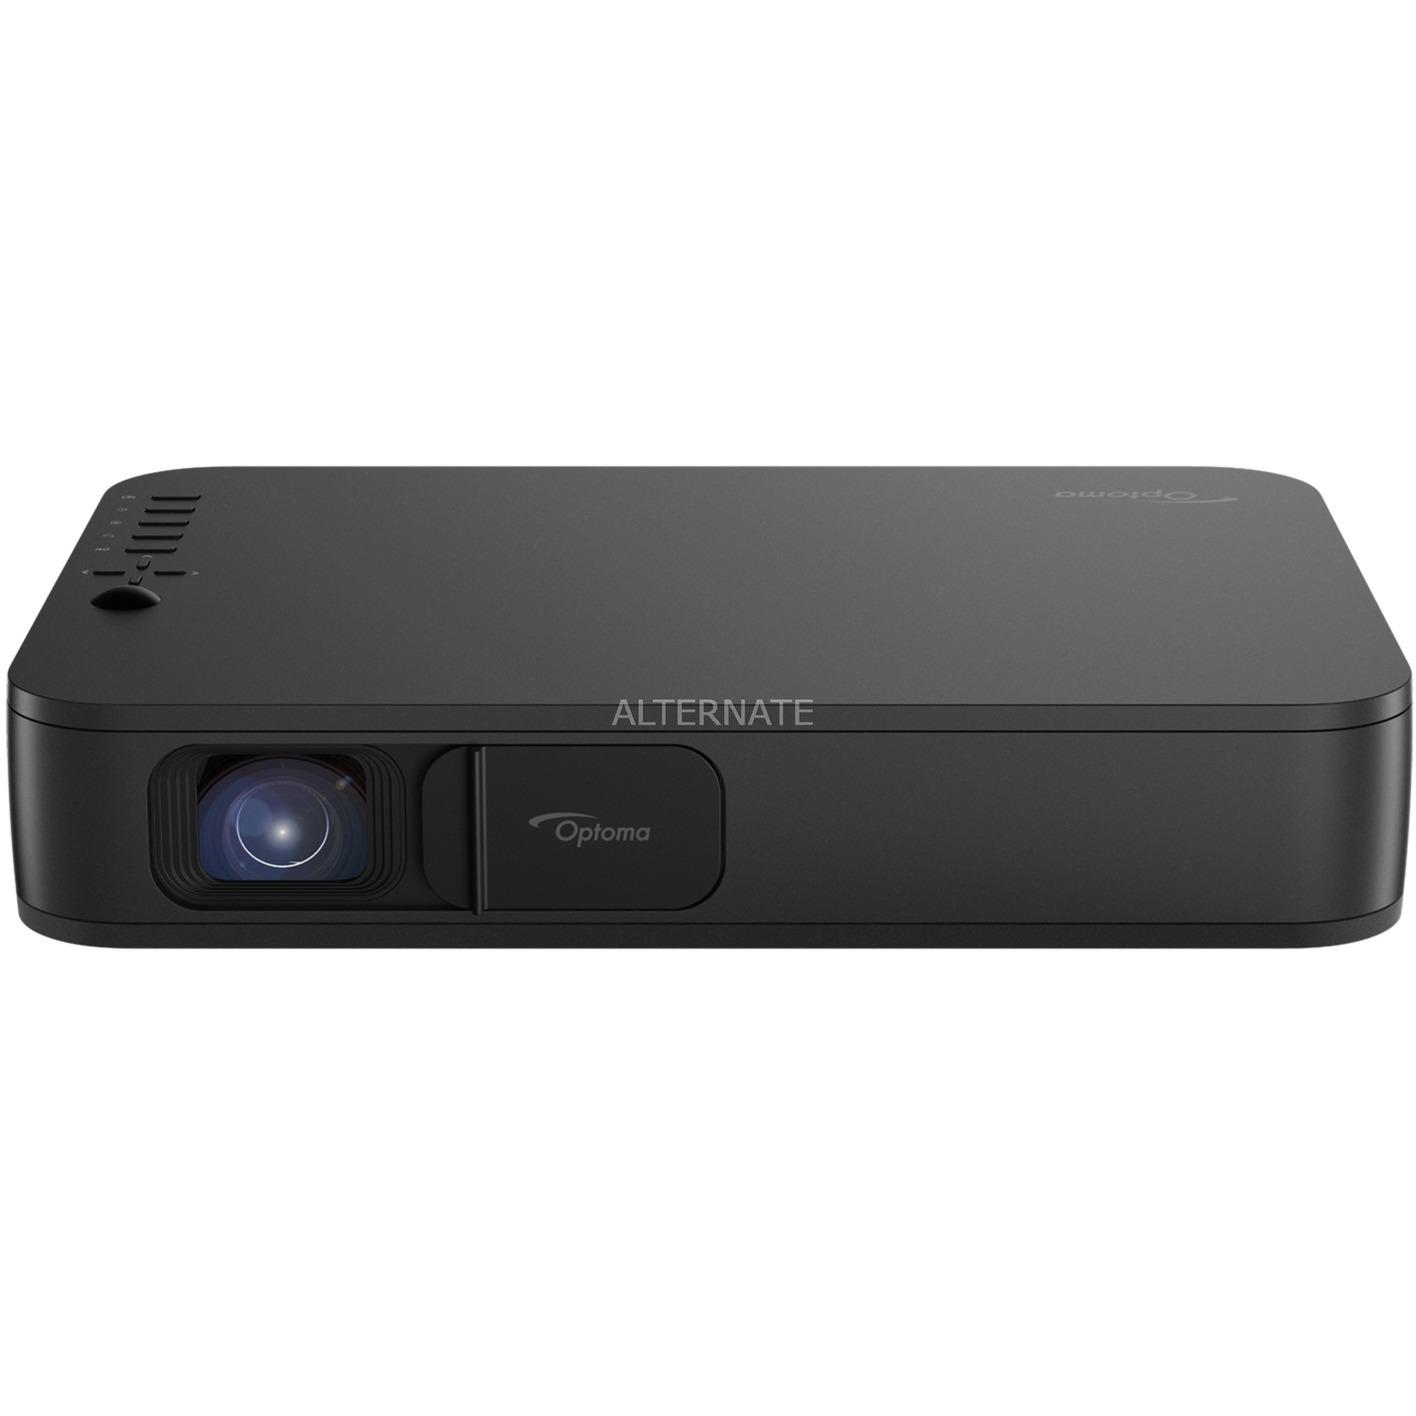 LH150 videoproyector 1300 lúmenes ANSI DLP 1080p (1920x1080) Proyector portátil Negro, Proyector DLP